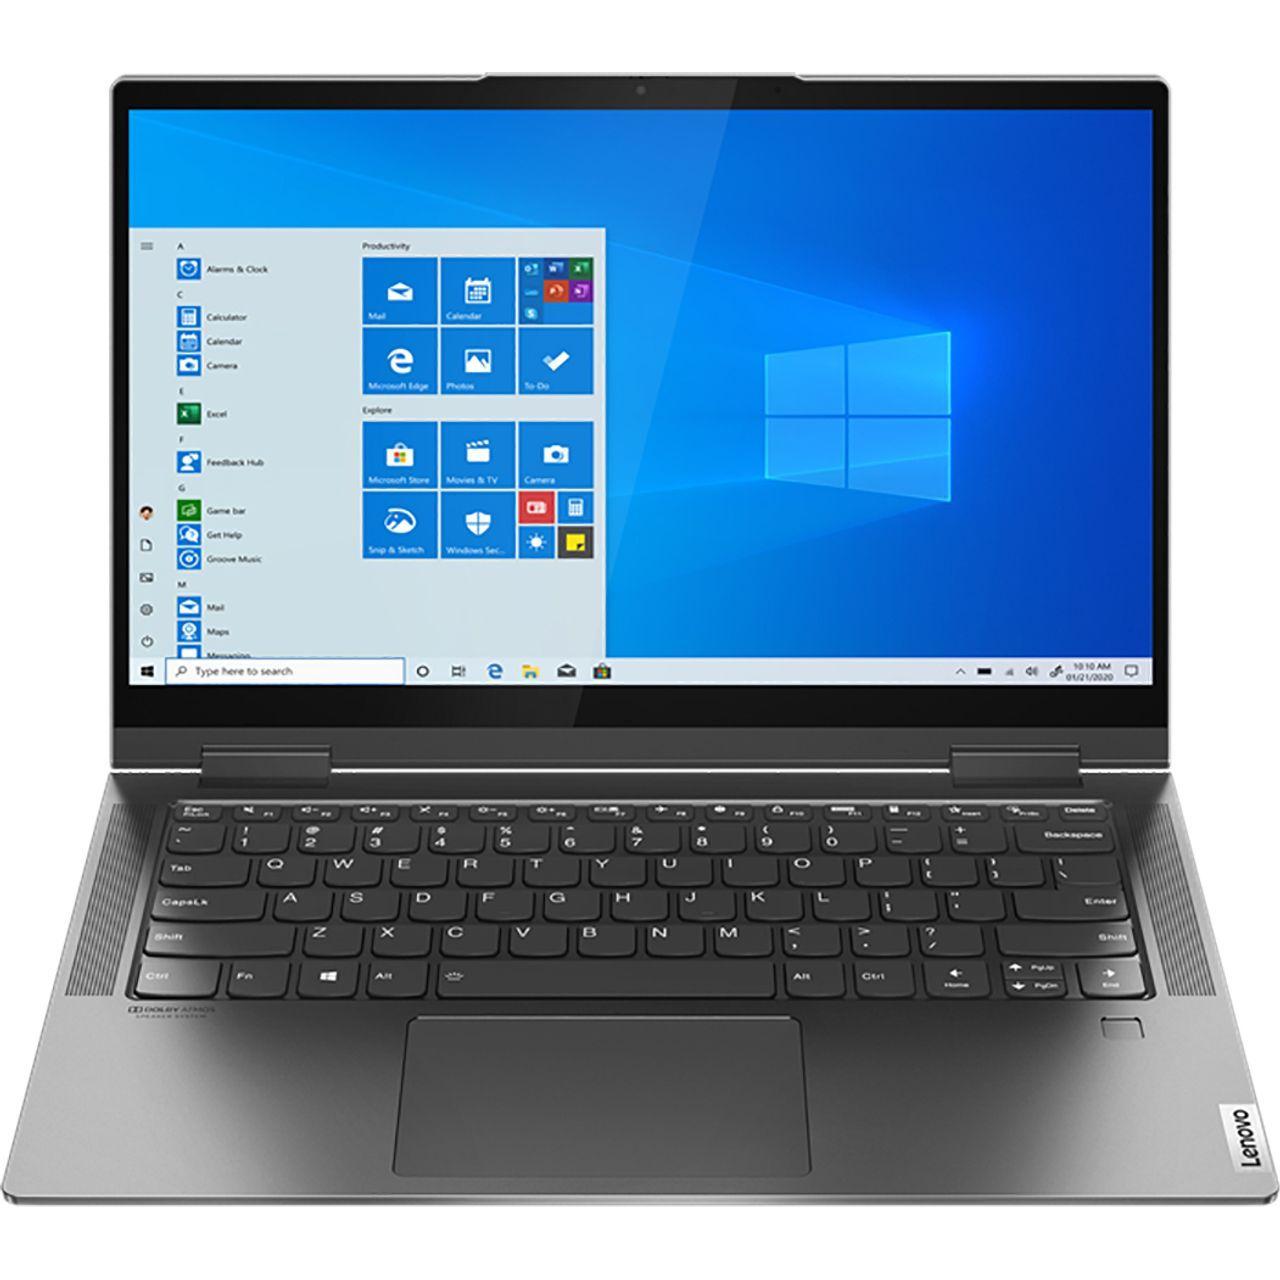 "Lenovo Yoga 7 14"" Laptop - Slate - £799 (UK Mainland) @ AO"